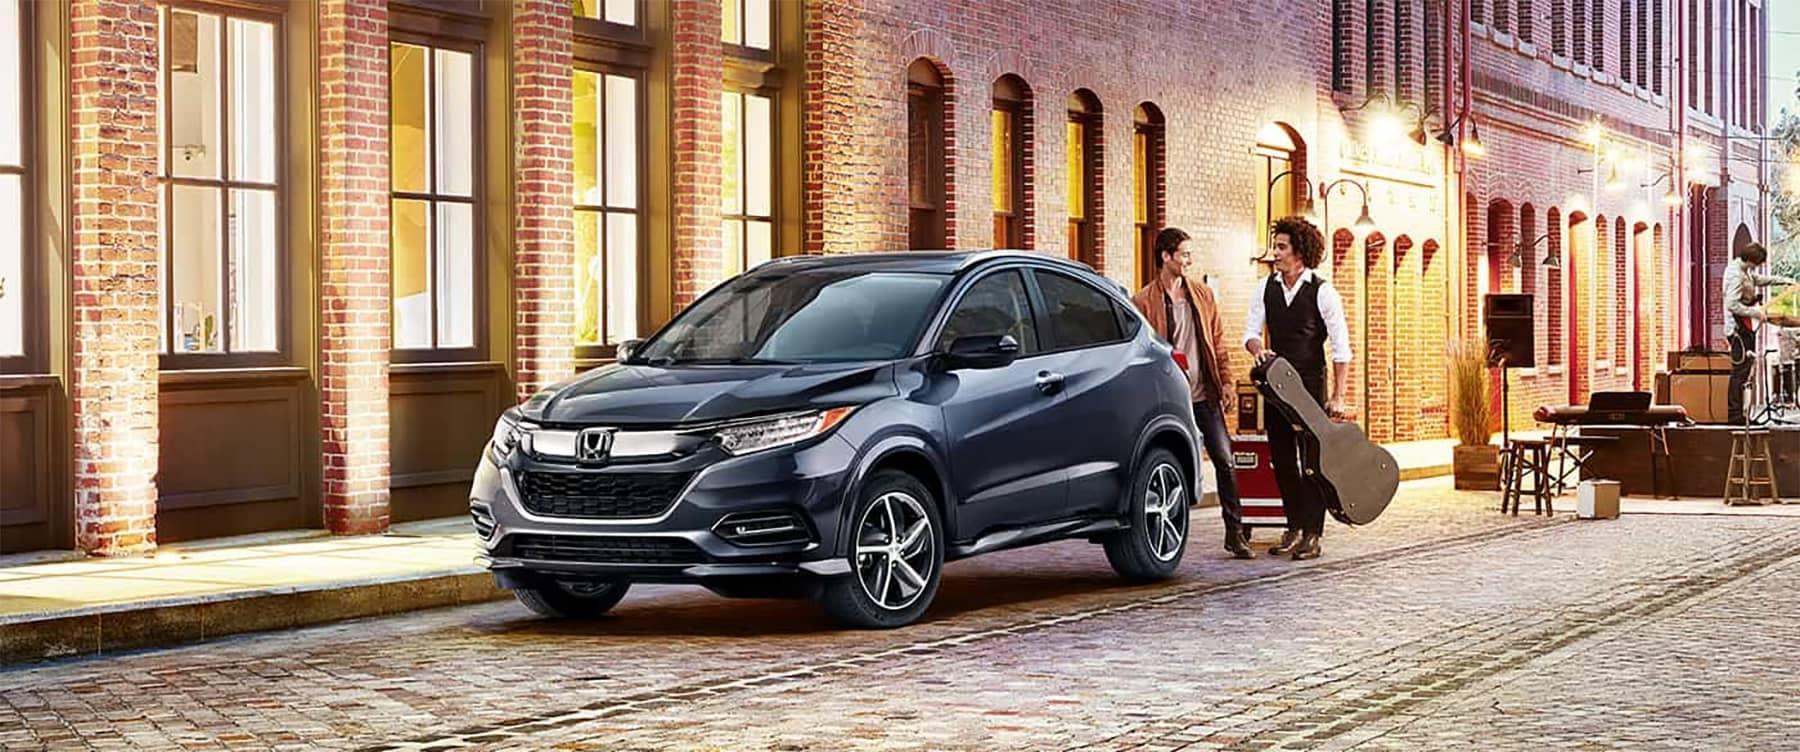 2019 Honda Hr-V Parked